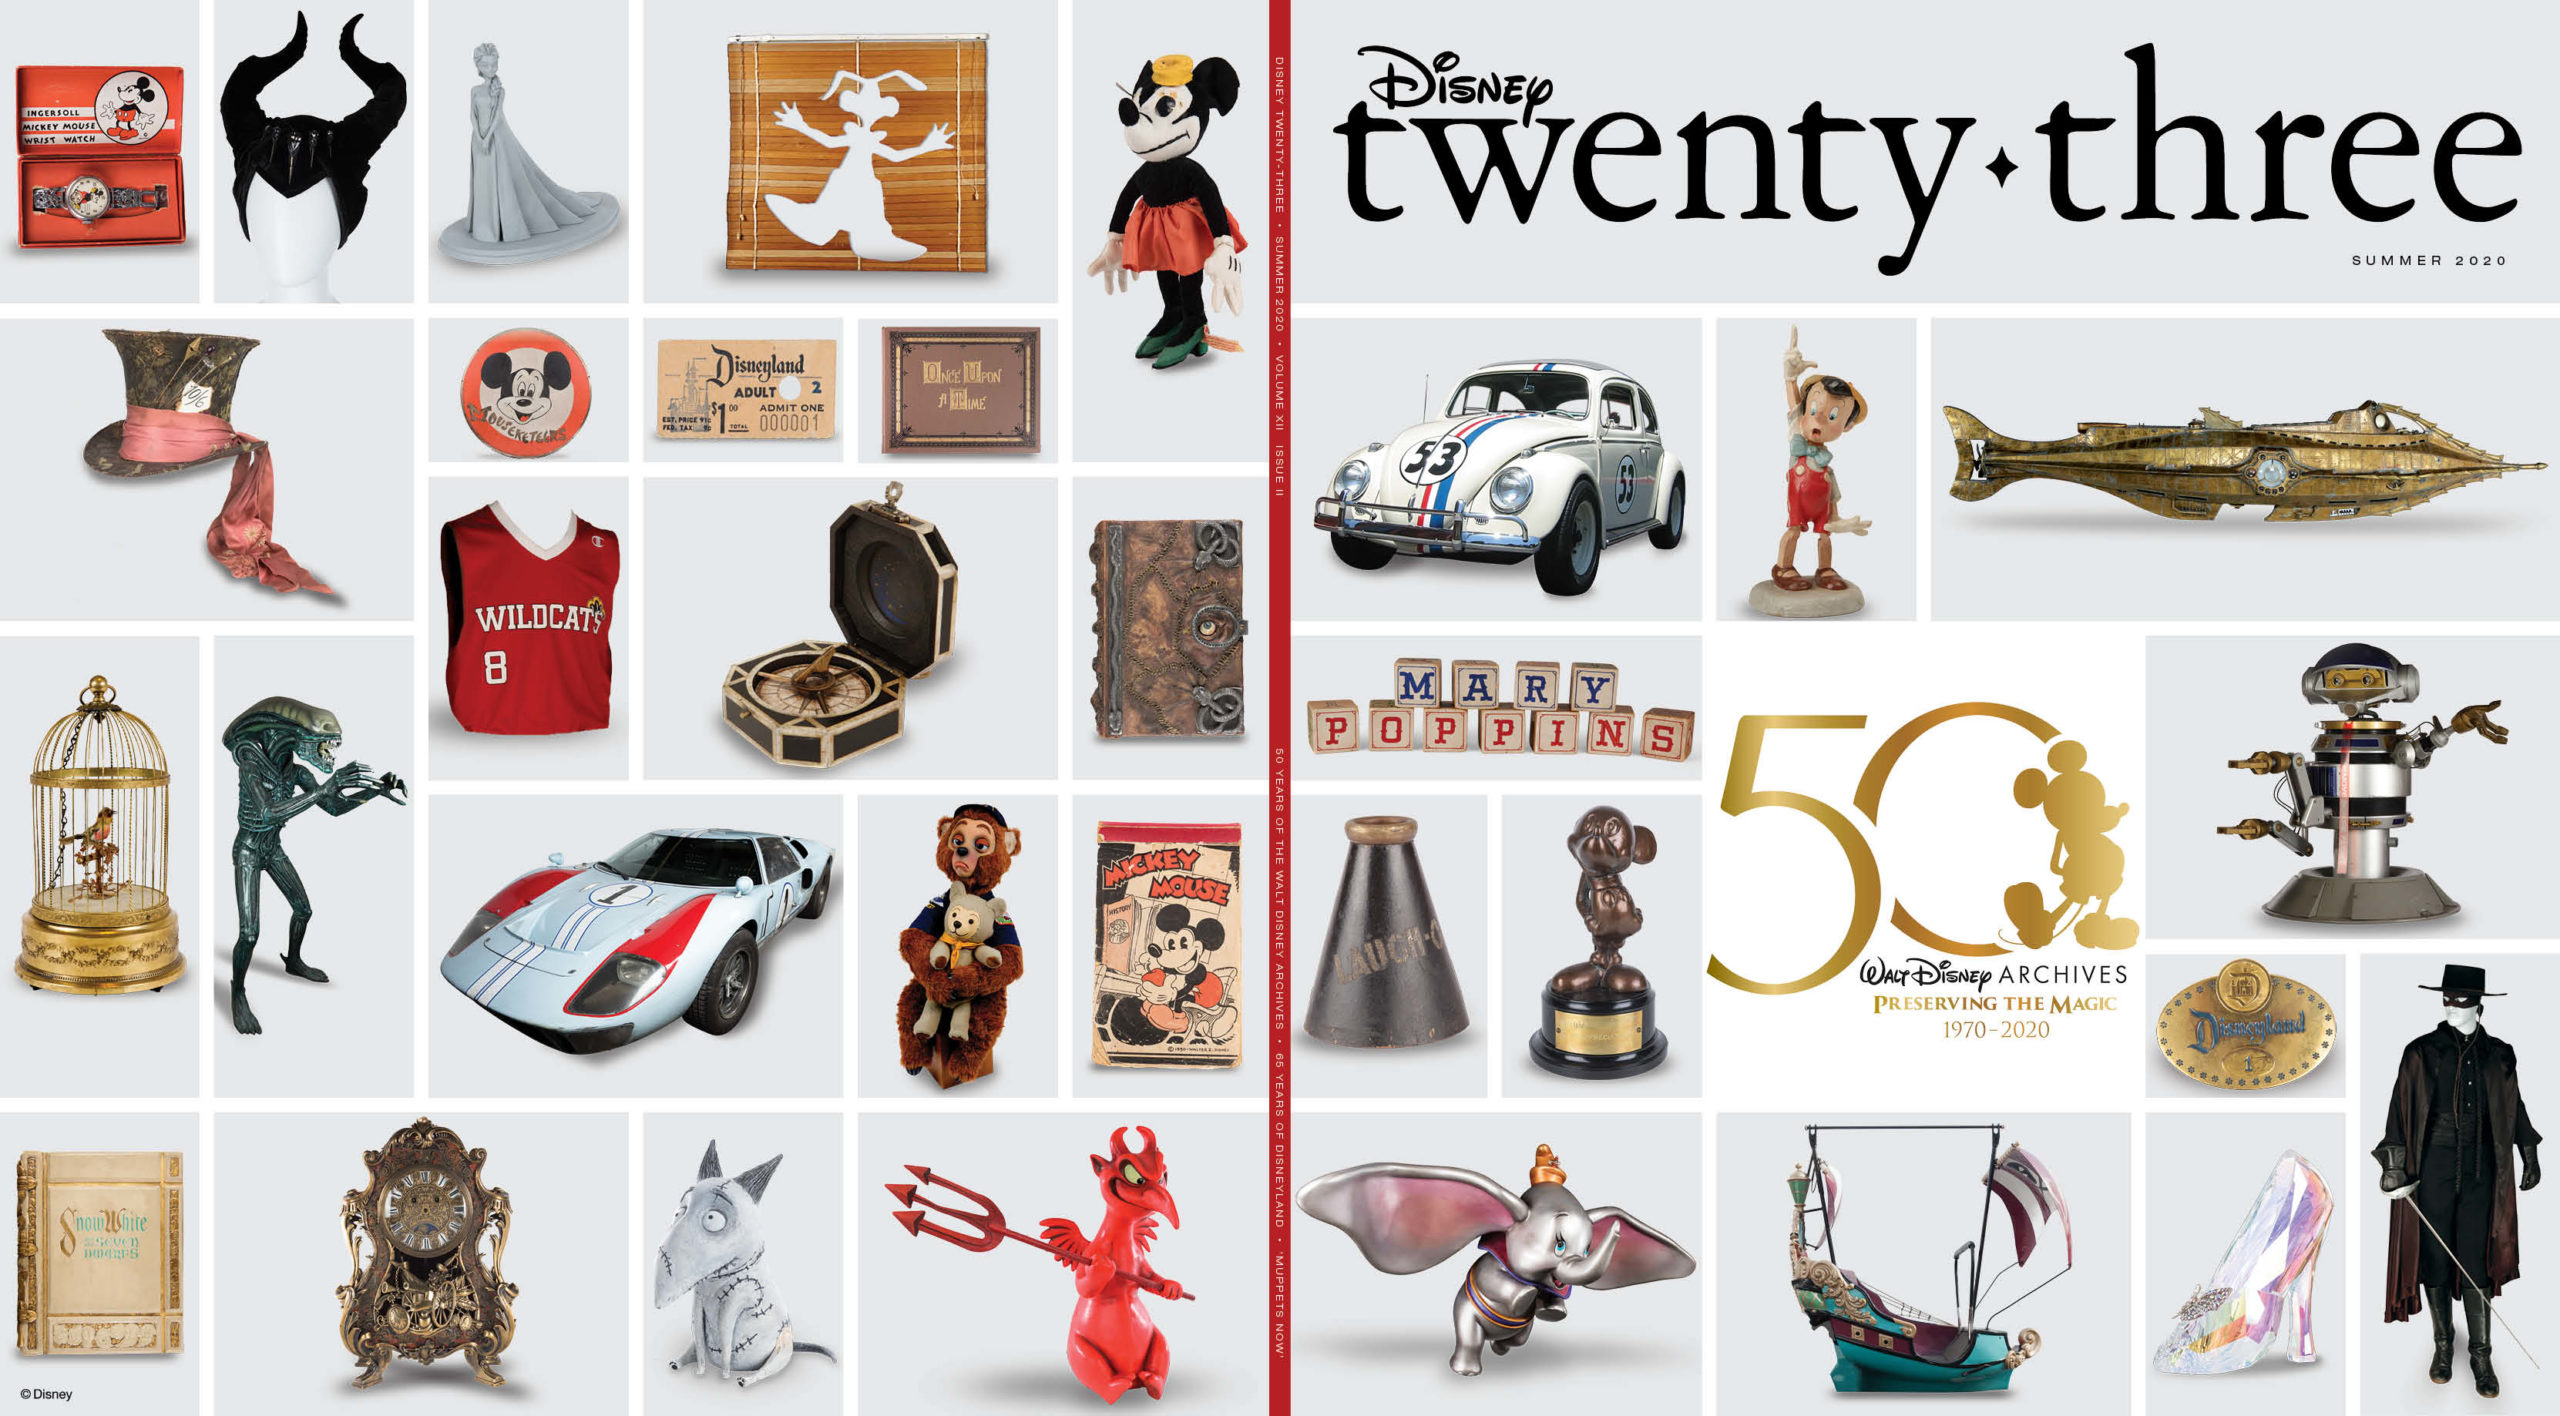 Disney Twenty-Three Summer 2020 Cover